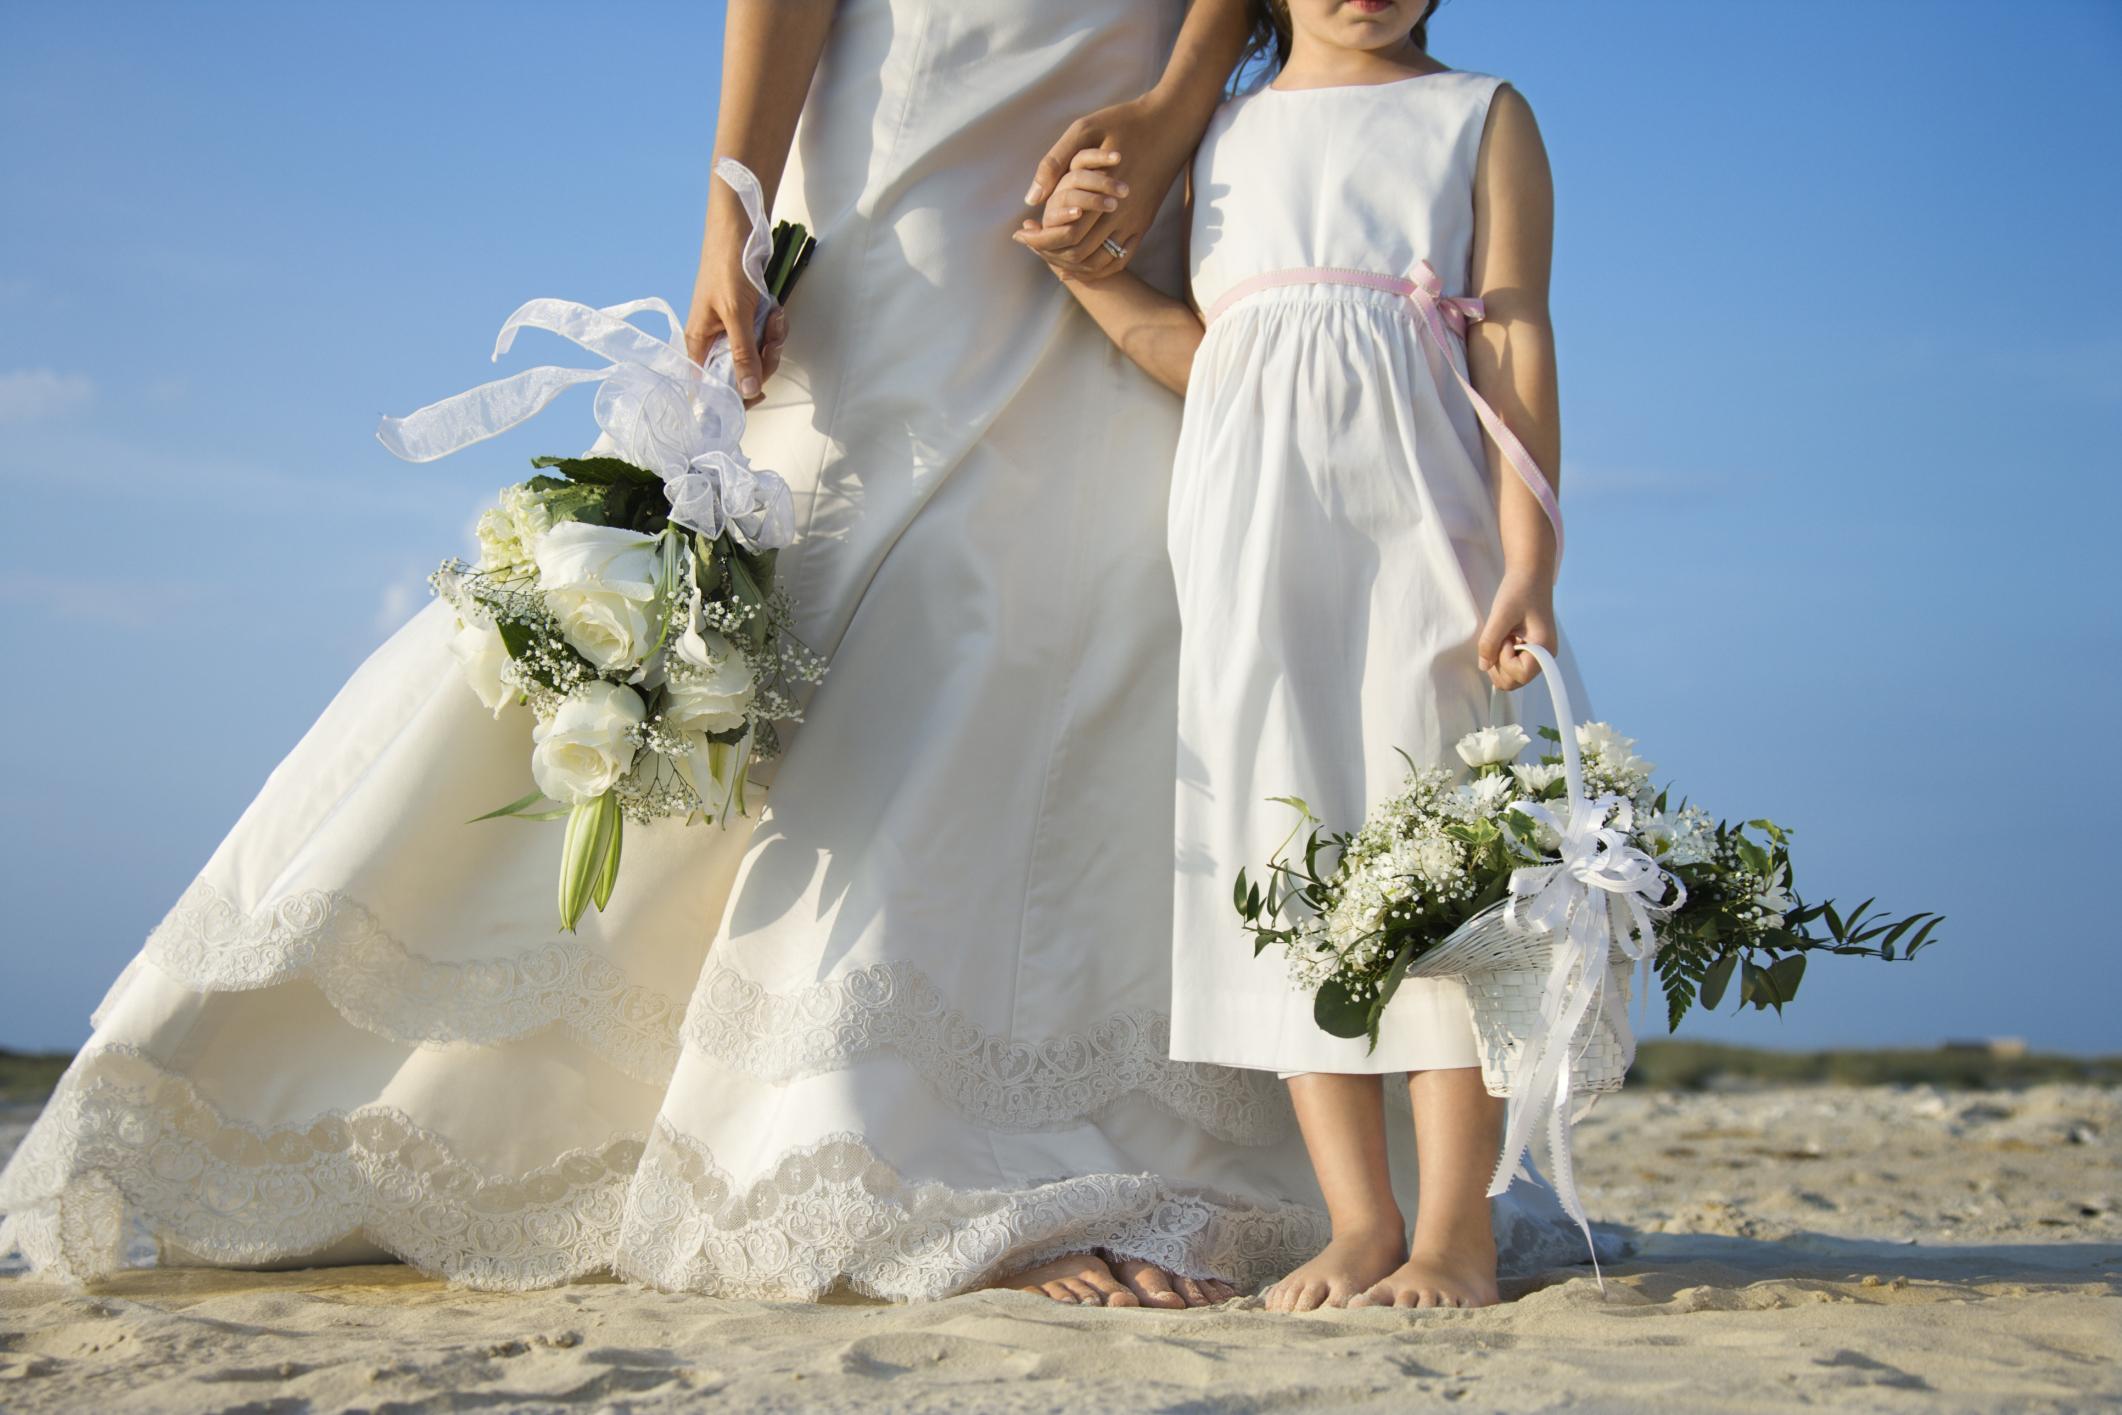 a6288481d2c0 Adorable ideas for flower girl dresses